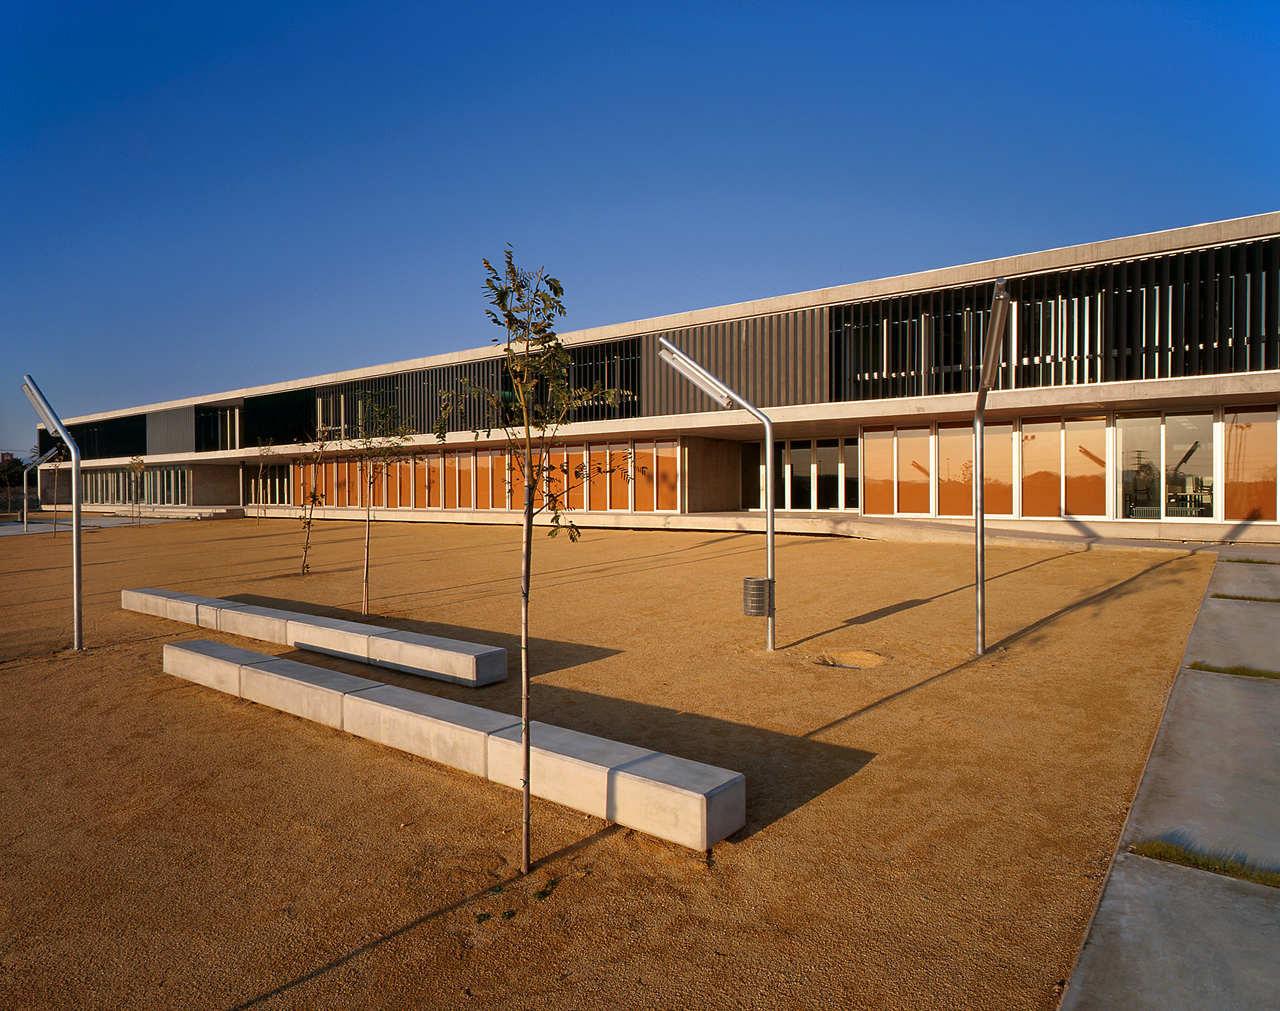 San Juan de Alicante Secondary School / Orts-Trullenque, © Diego Opazo